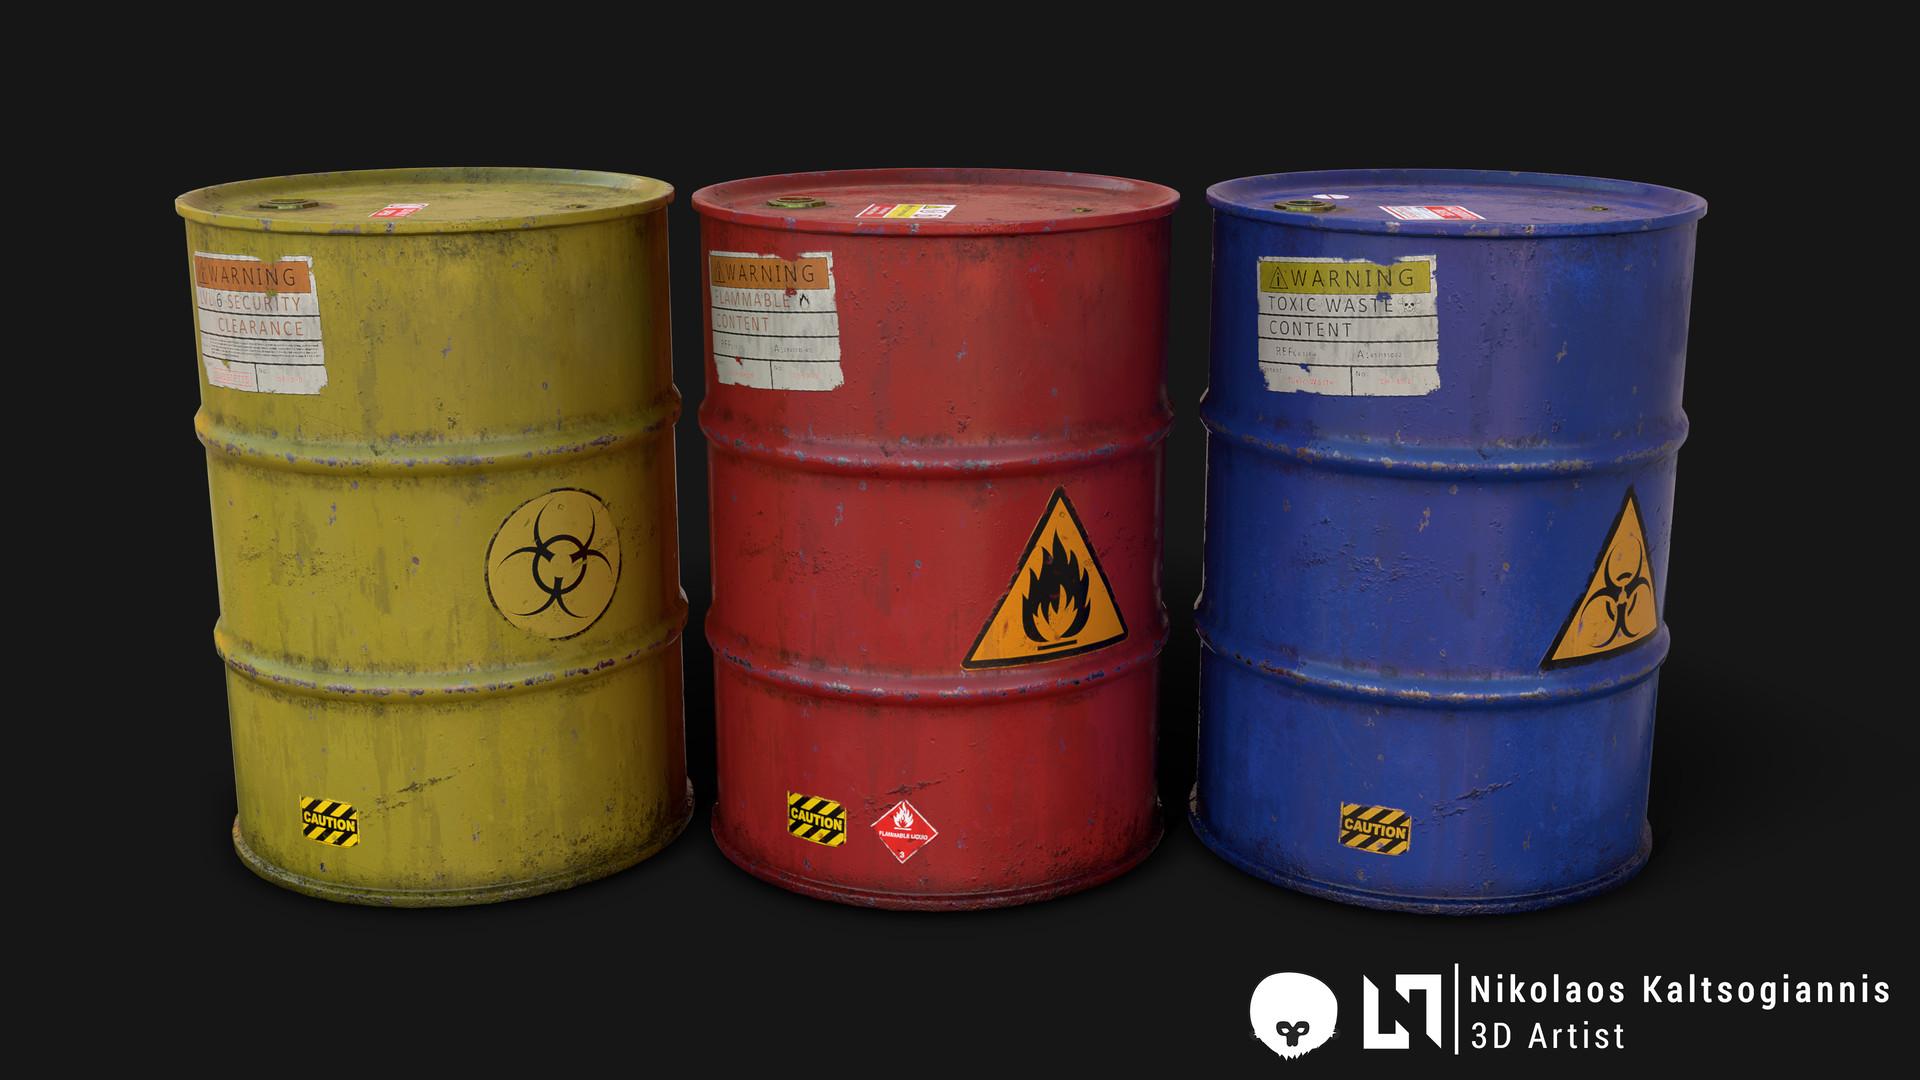 Nikolaos kaltsogiannis steel barrel 04